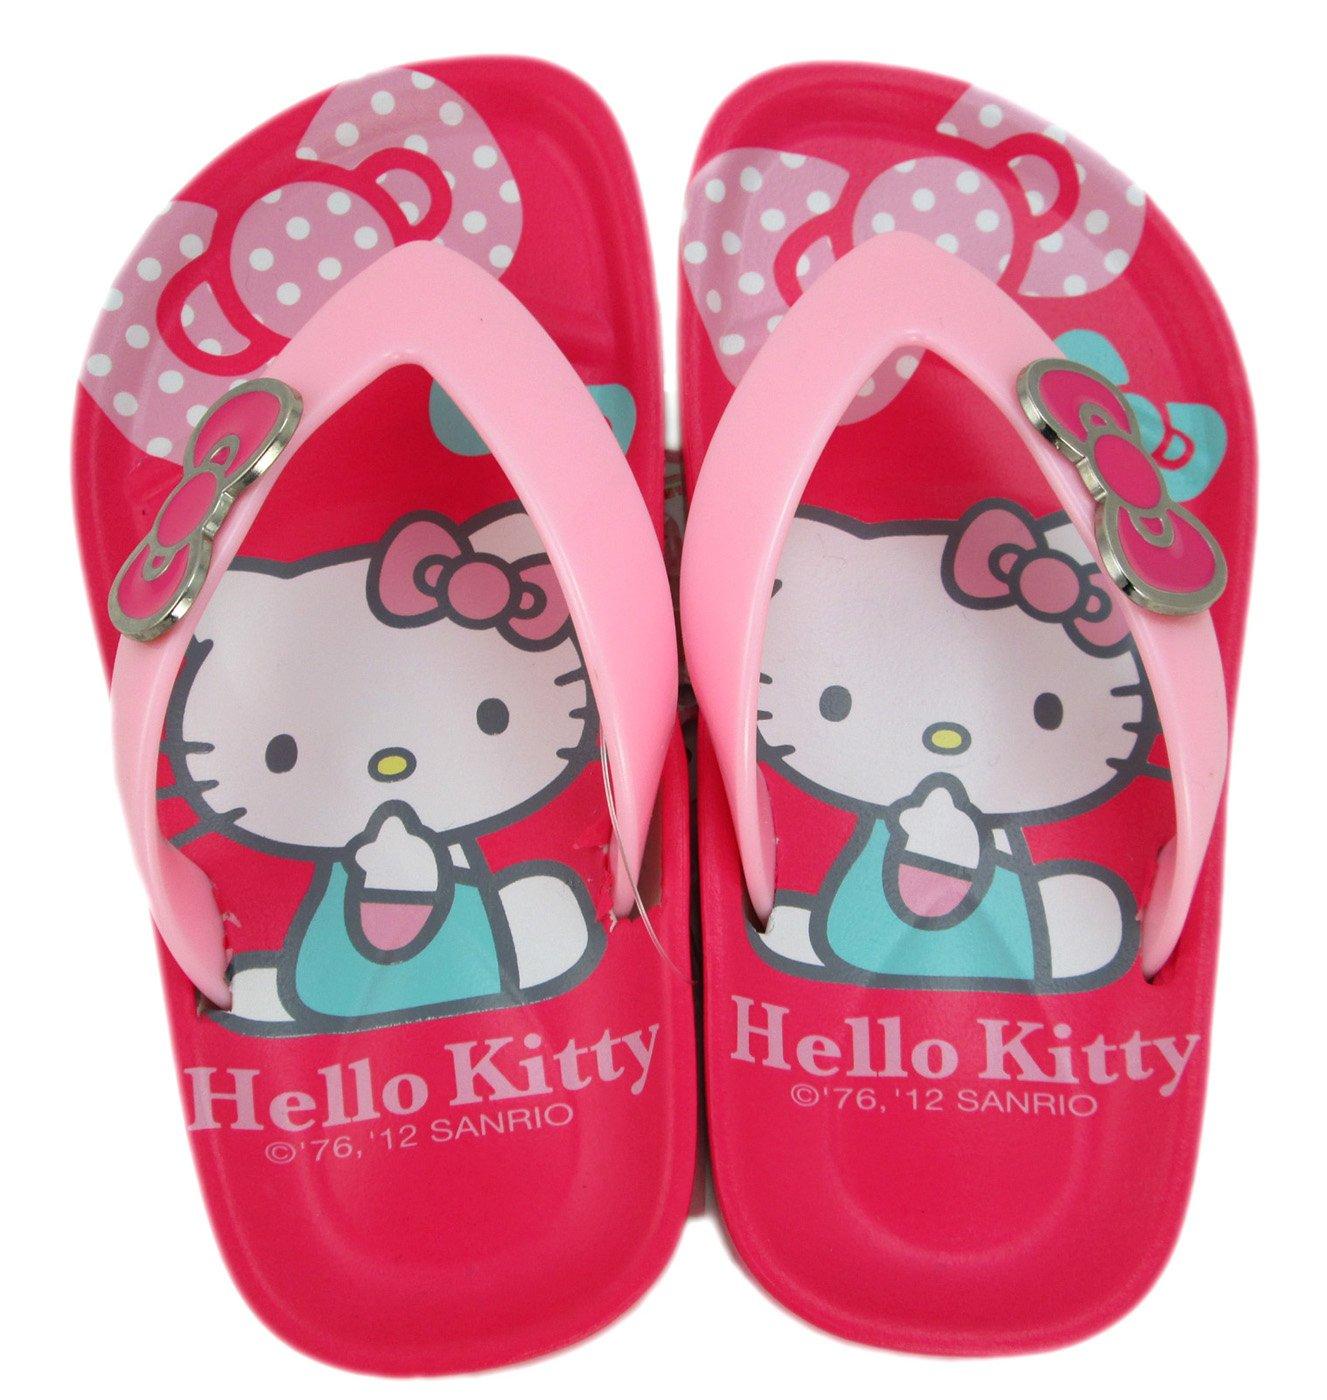 008517d43 Amazon.com  Size 6 Pink Hello Kitty Flip Flops - Hello Kitty Sandals  Beauty